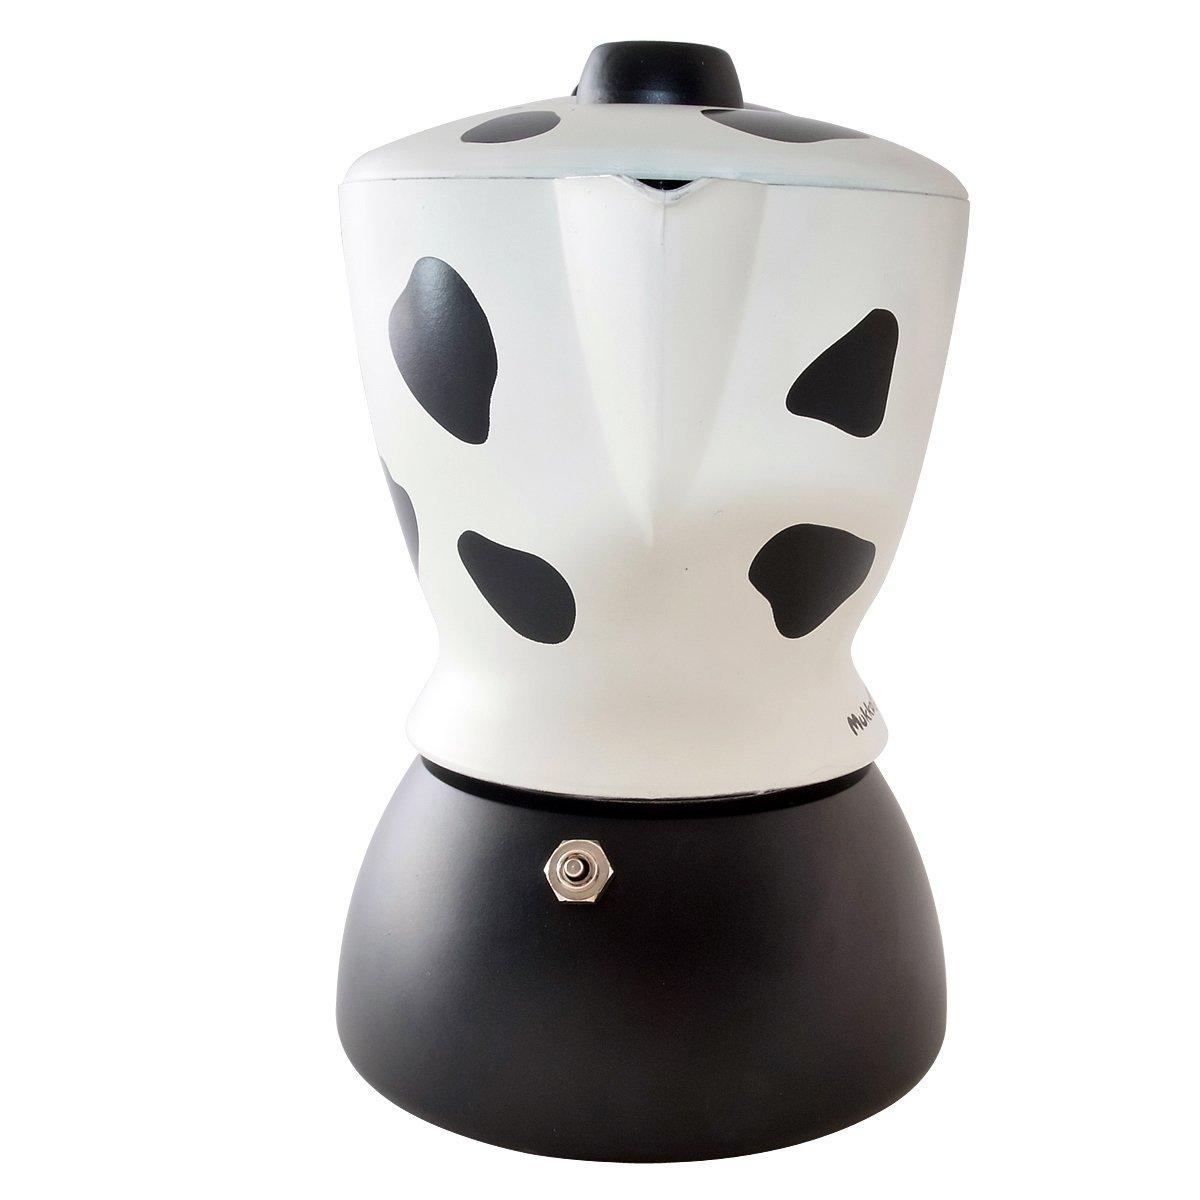 "Кофеварка гейзерная ""Mukka"" на 2 чашки Bialetti MUKKA, черный с белым Bialetti 0003418/NP фото 2"